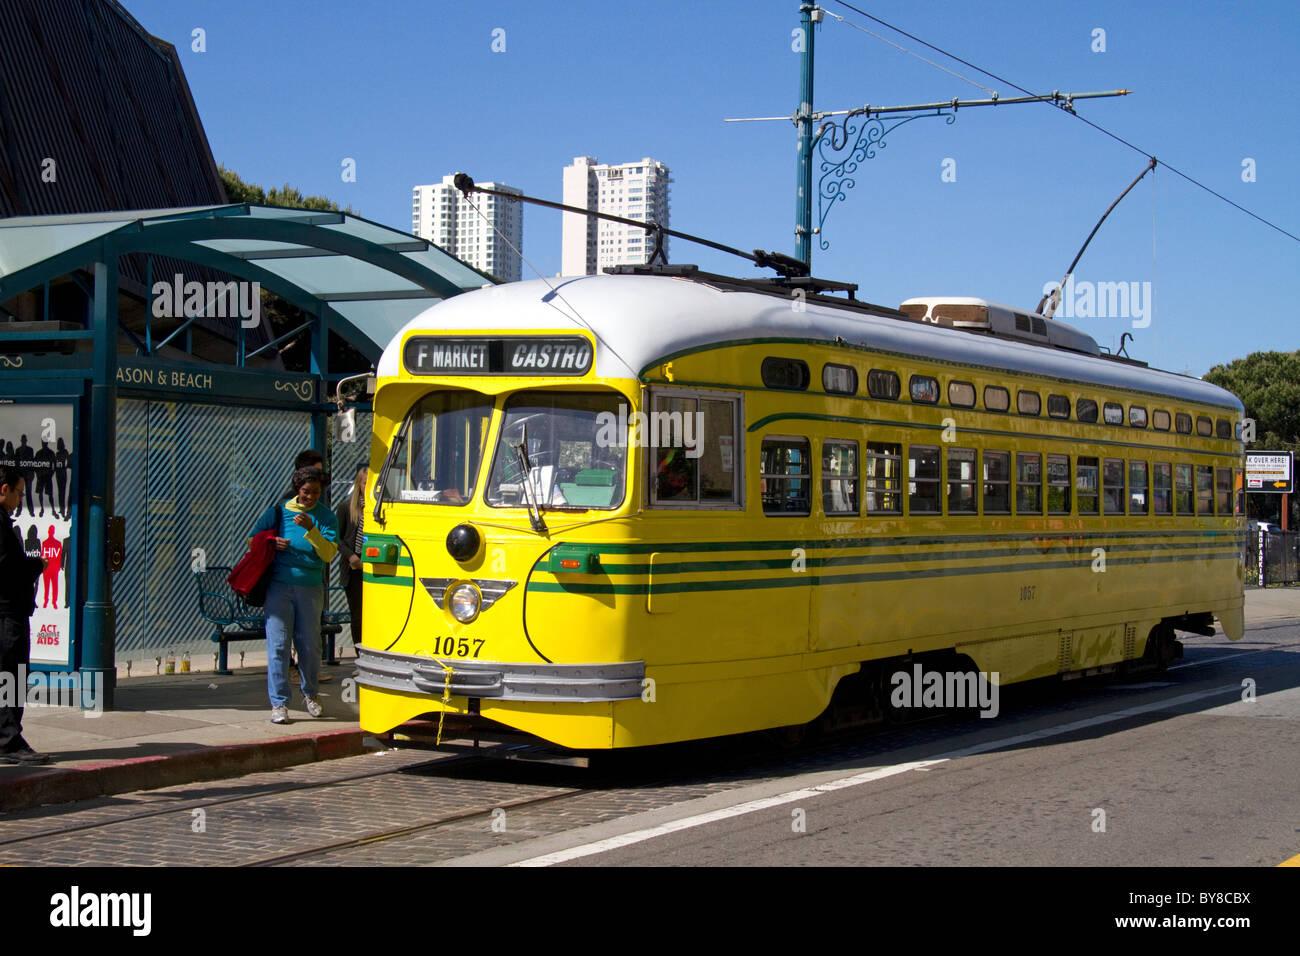 Transports publics tramway rétro à San Francisco, Californie, USA. Photo Stock